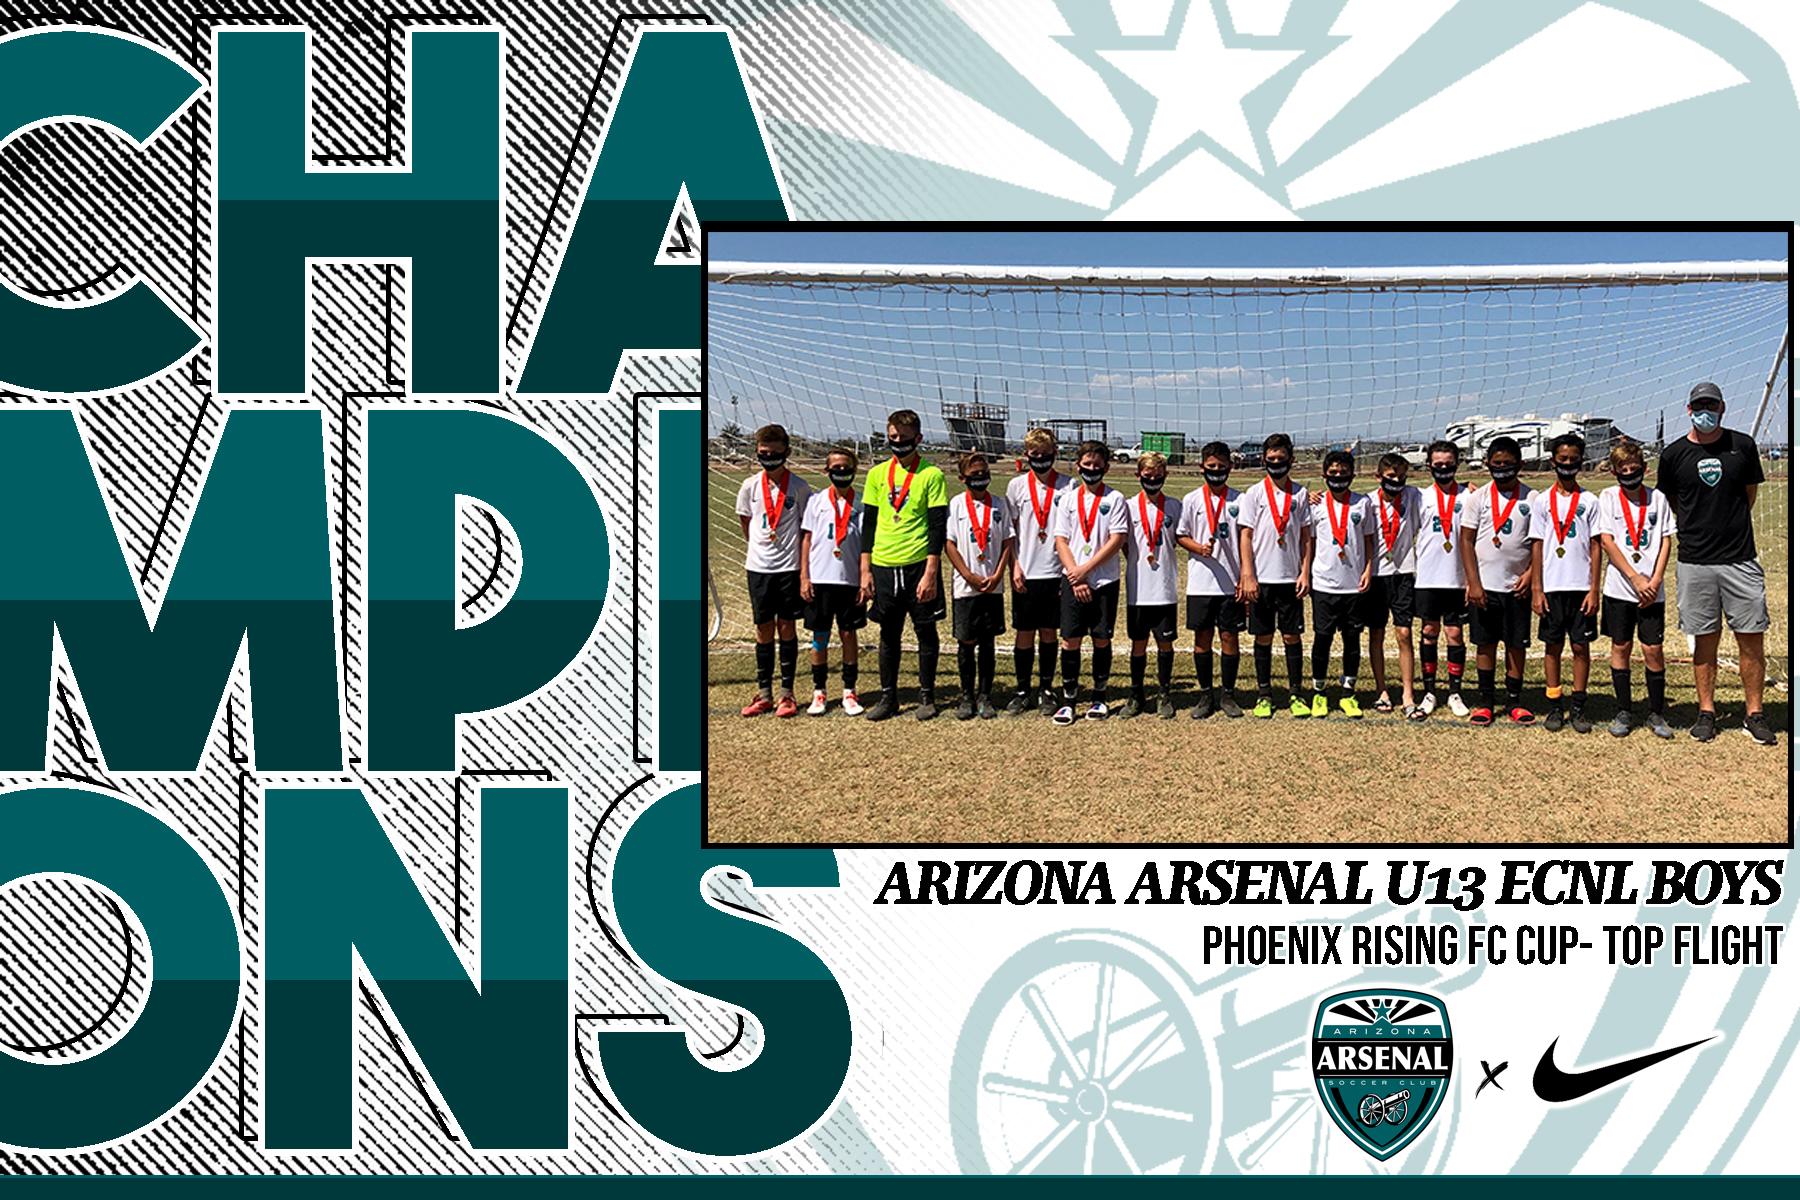 Arizona Arsenal Soccer Club Home